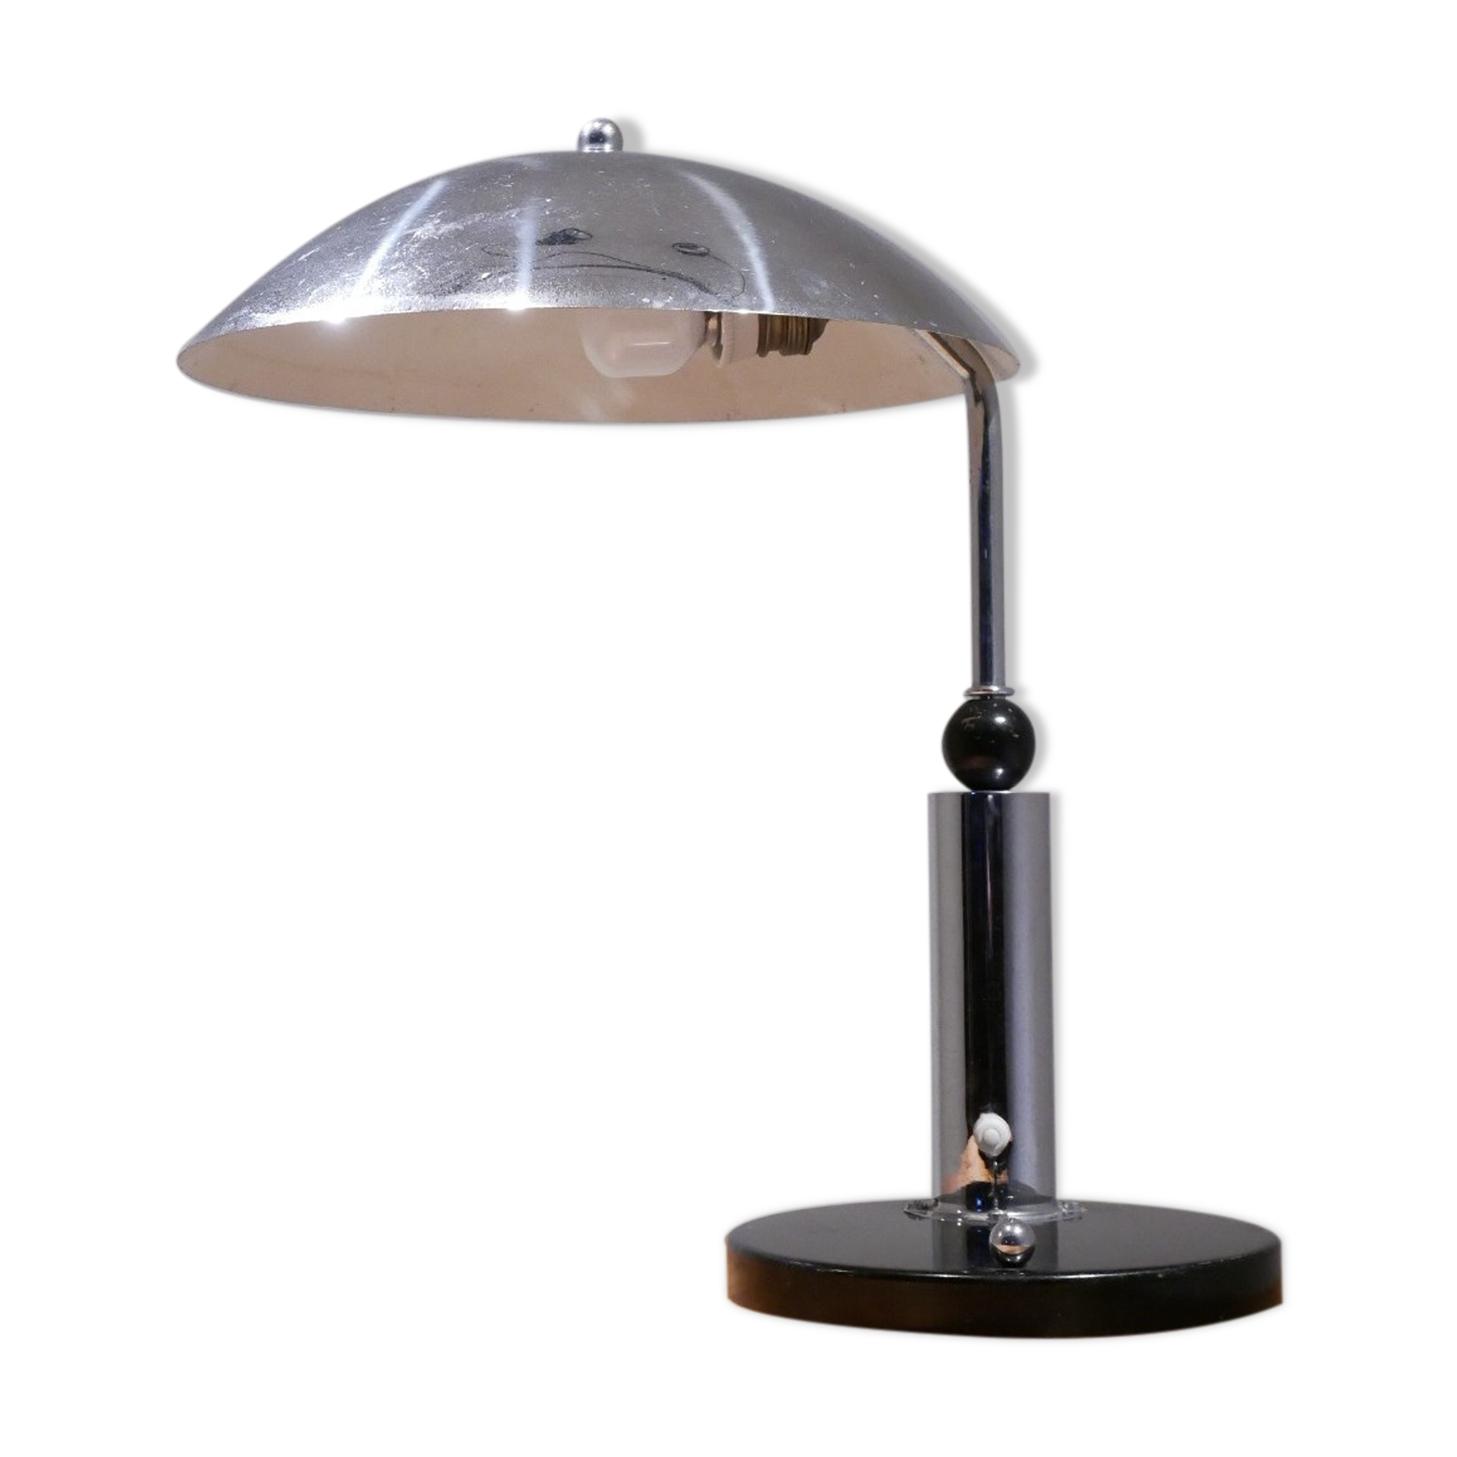 Lampe de bureau KMD Daalderop 1935